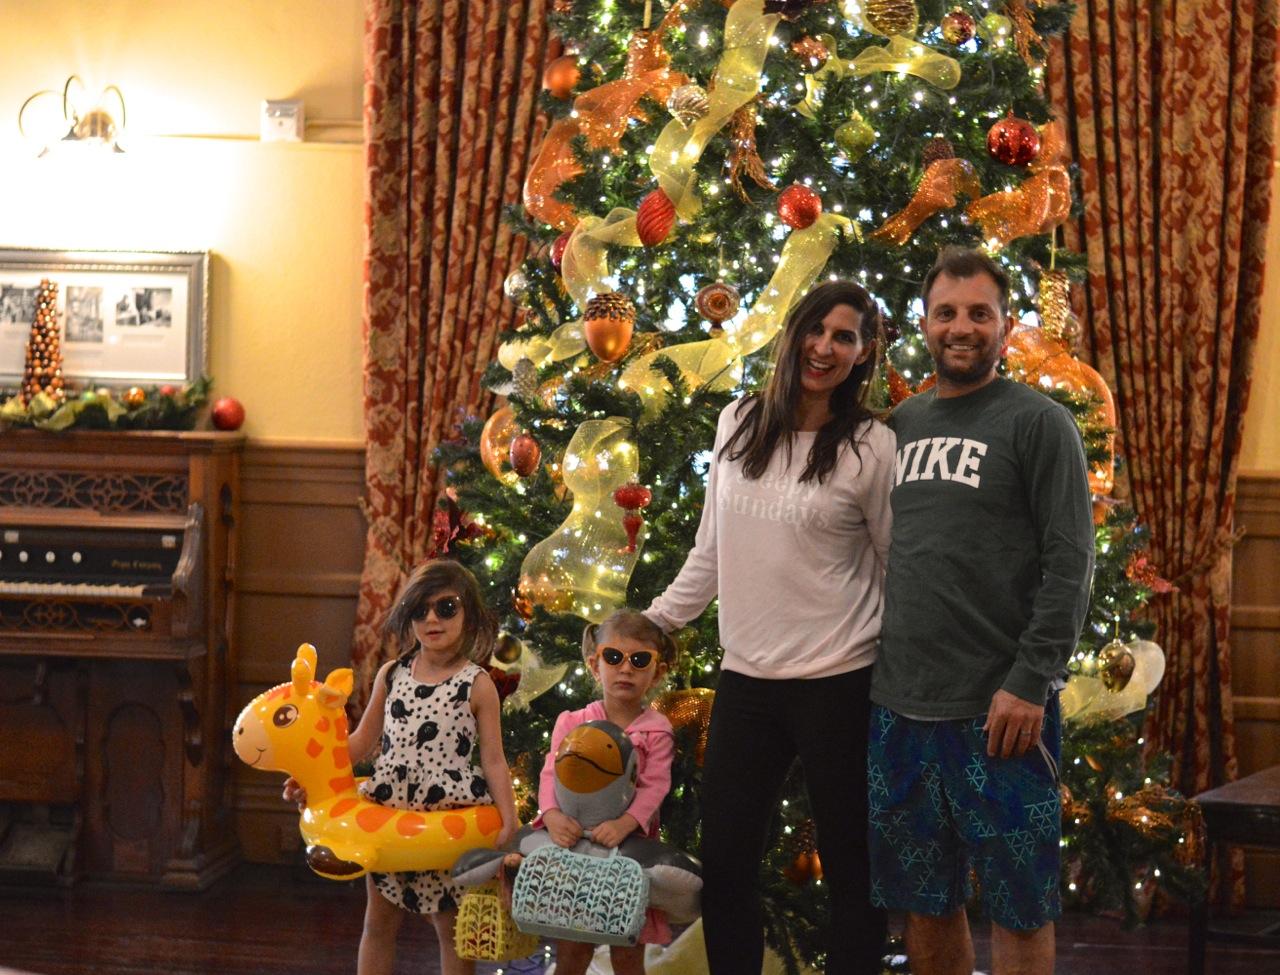 Colorado Hotel Glenwood Springs at Christmastime 1.jpg